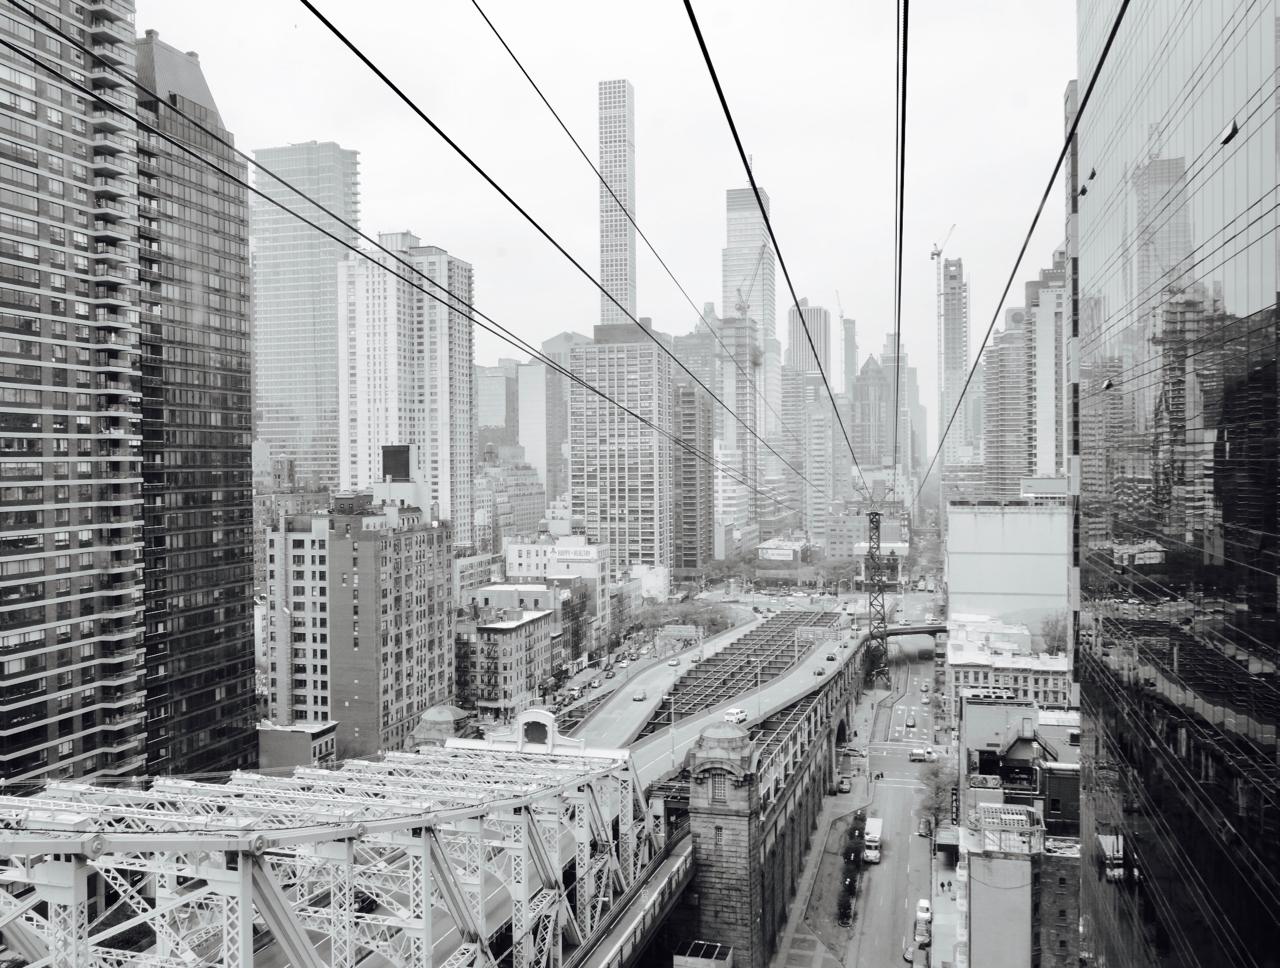 Tramline Queensboro Bridge, NYC 2017